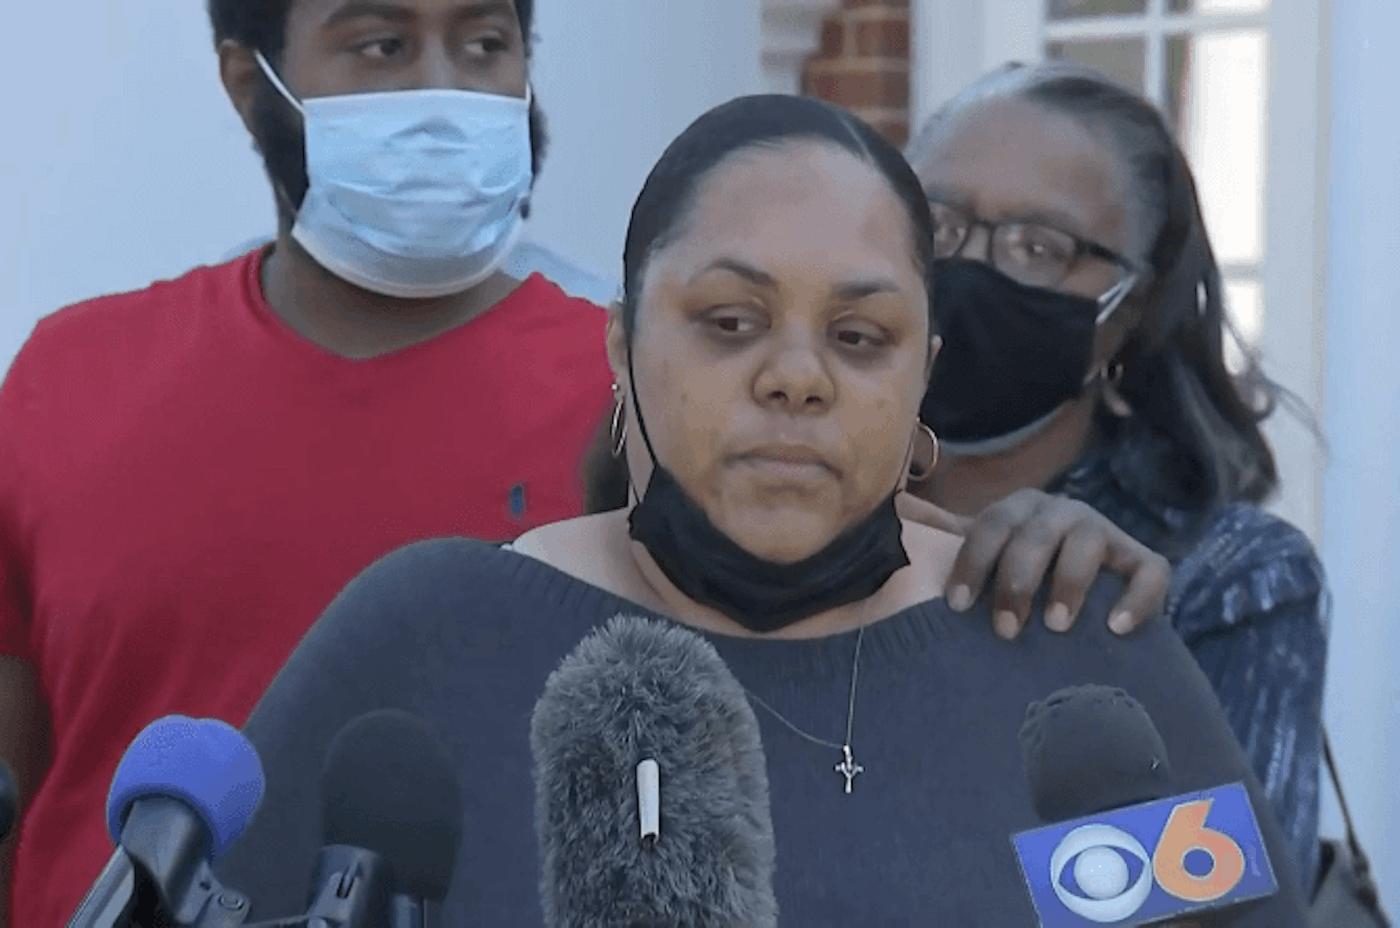 Isaiah Brown's sister Yolanda (center) spoke during Monday's press conference. Photo by Brian Carlton.